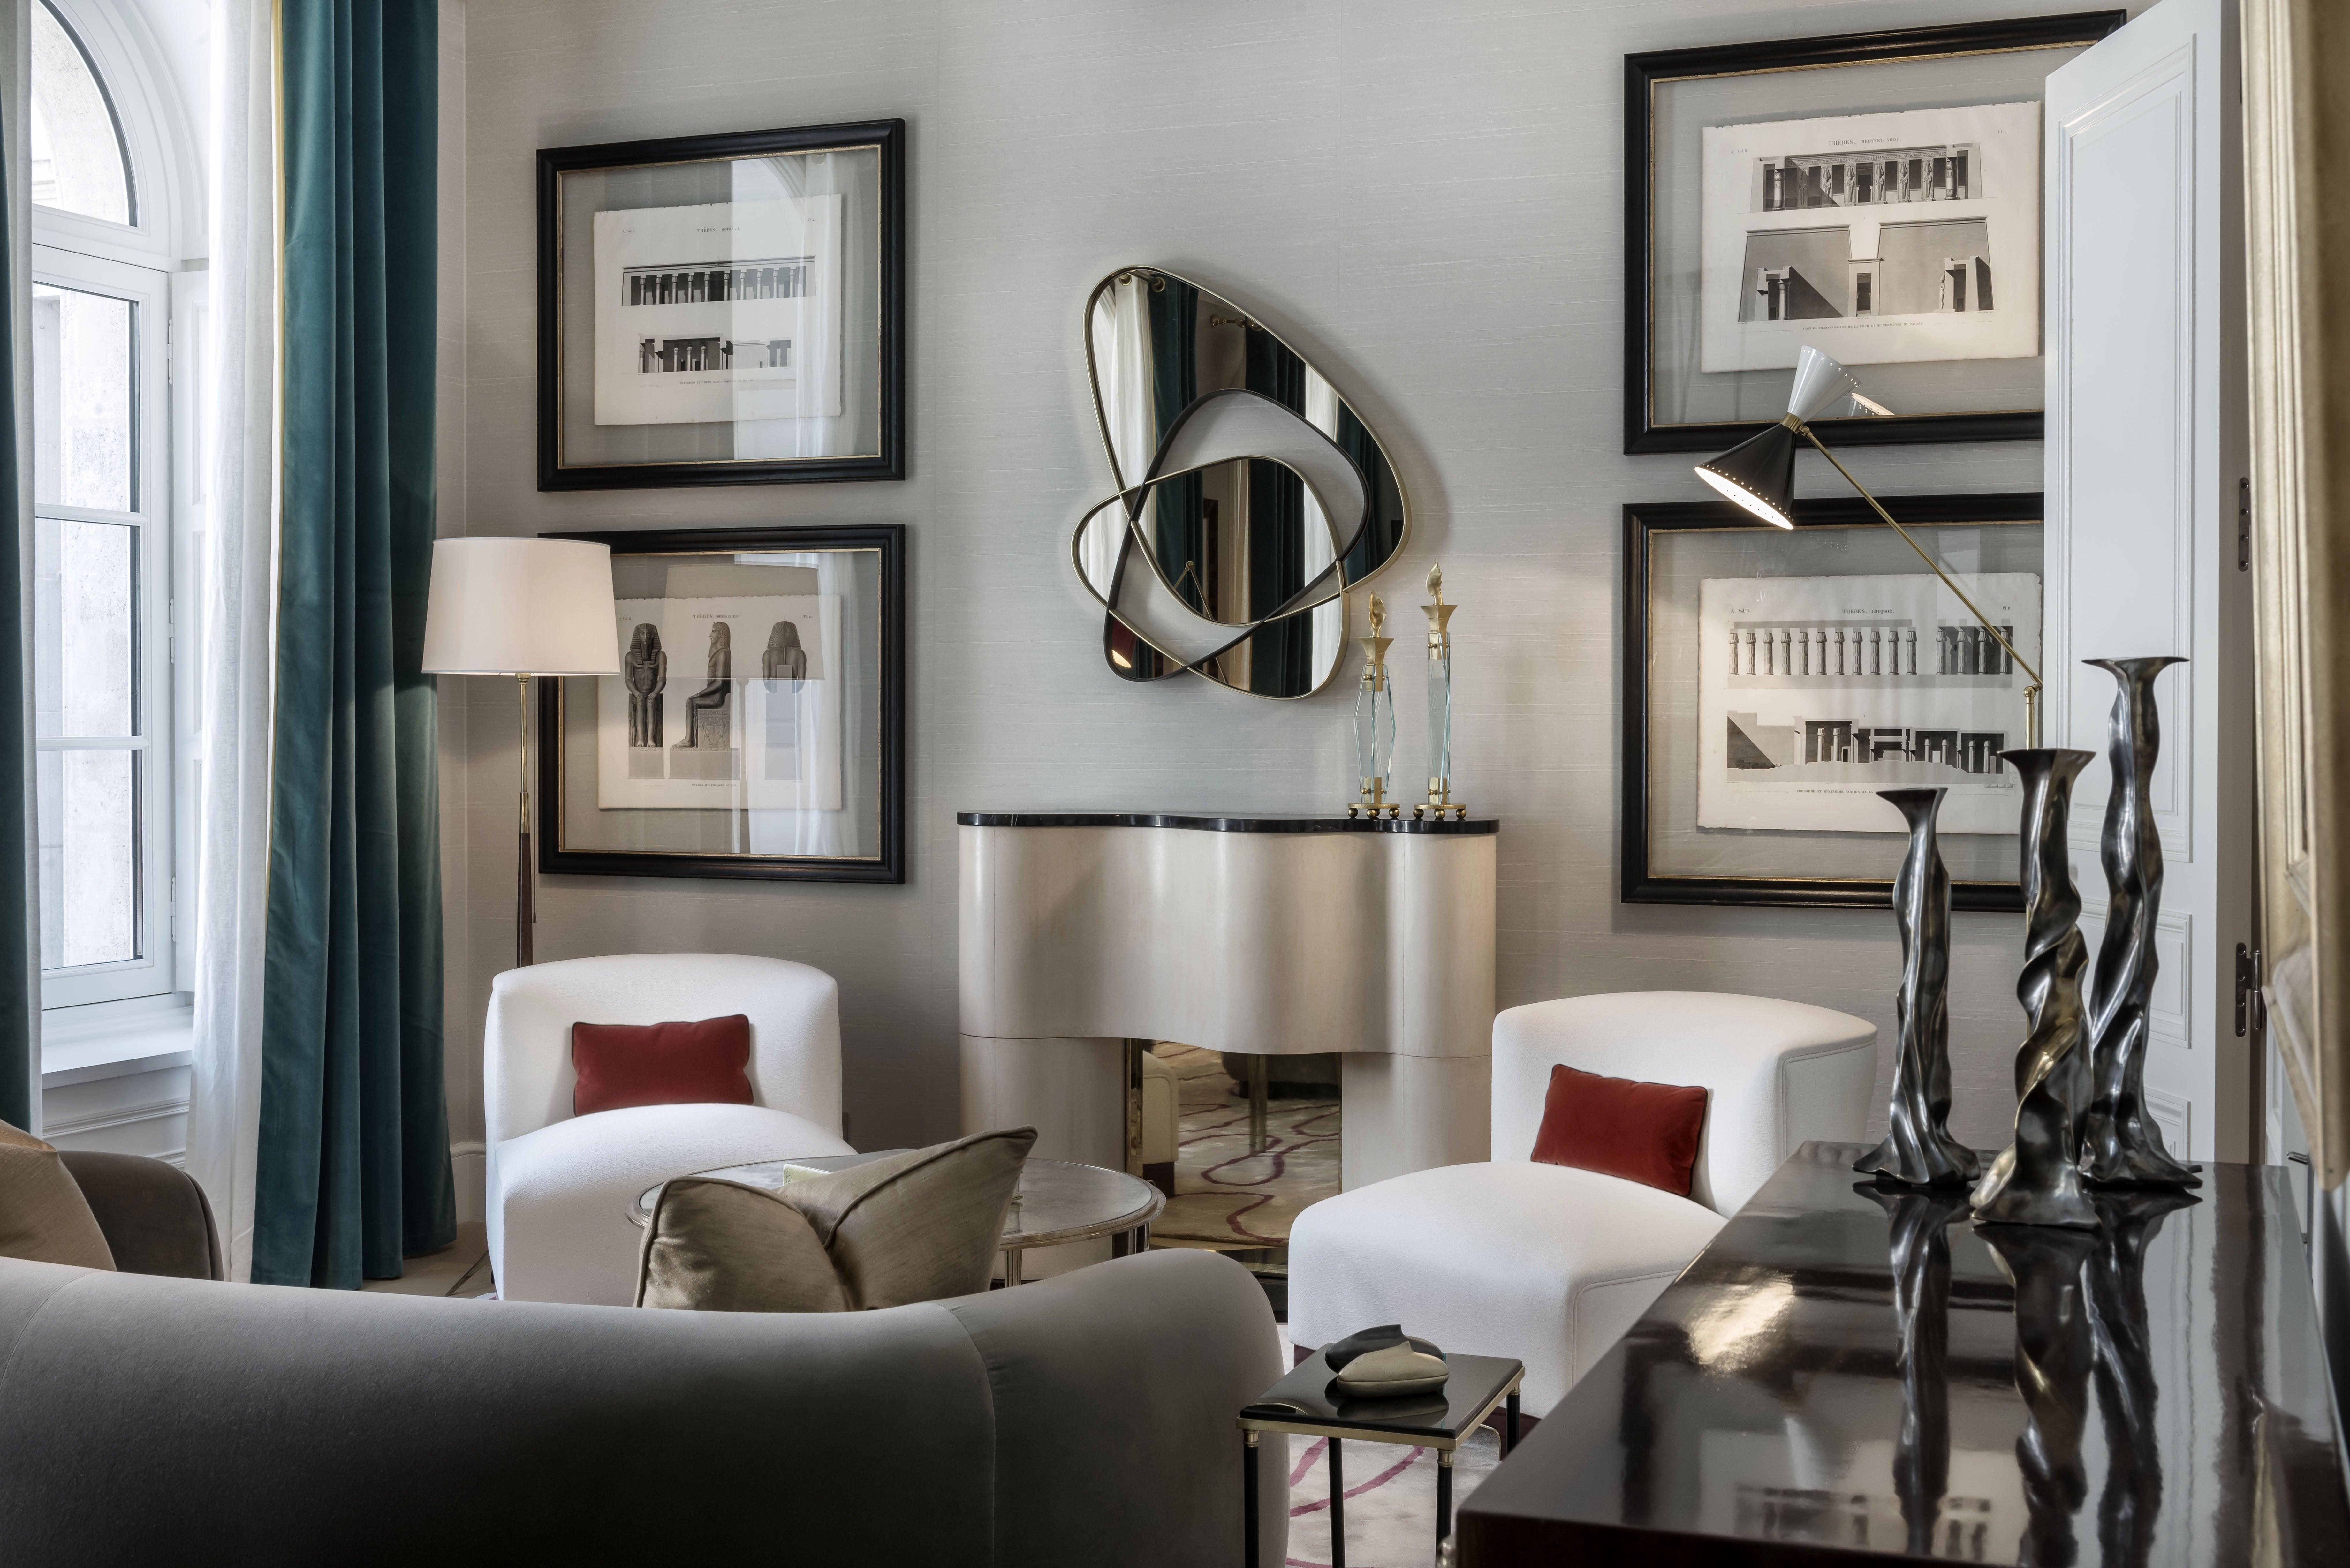 Paris Apartment Living Room Iv By Achille Salvagni